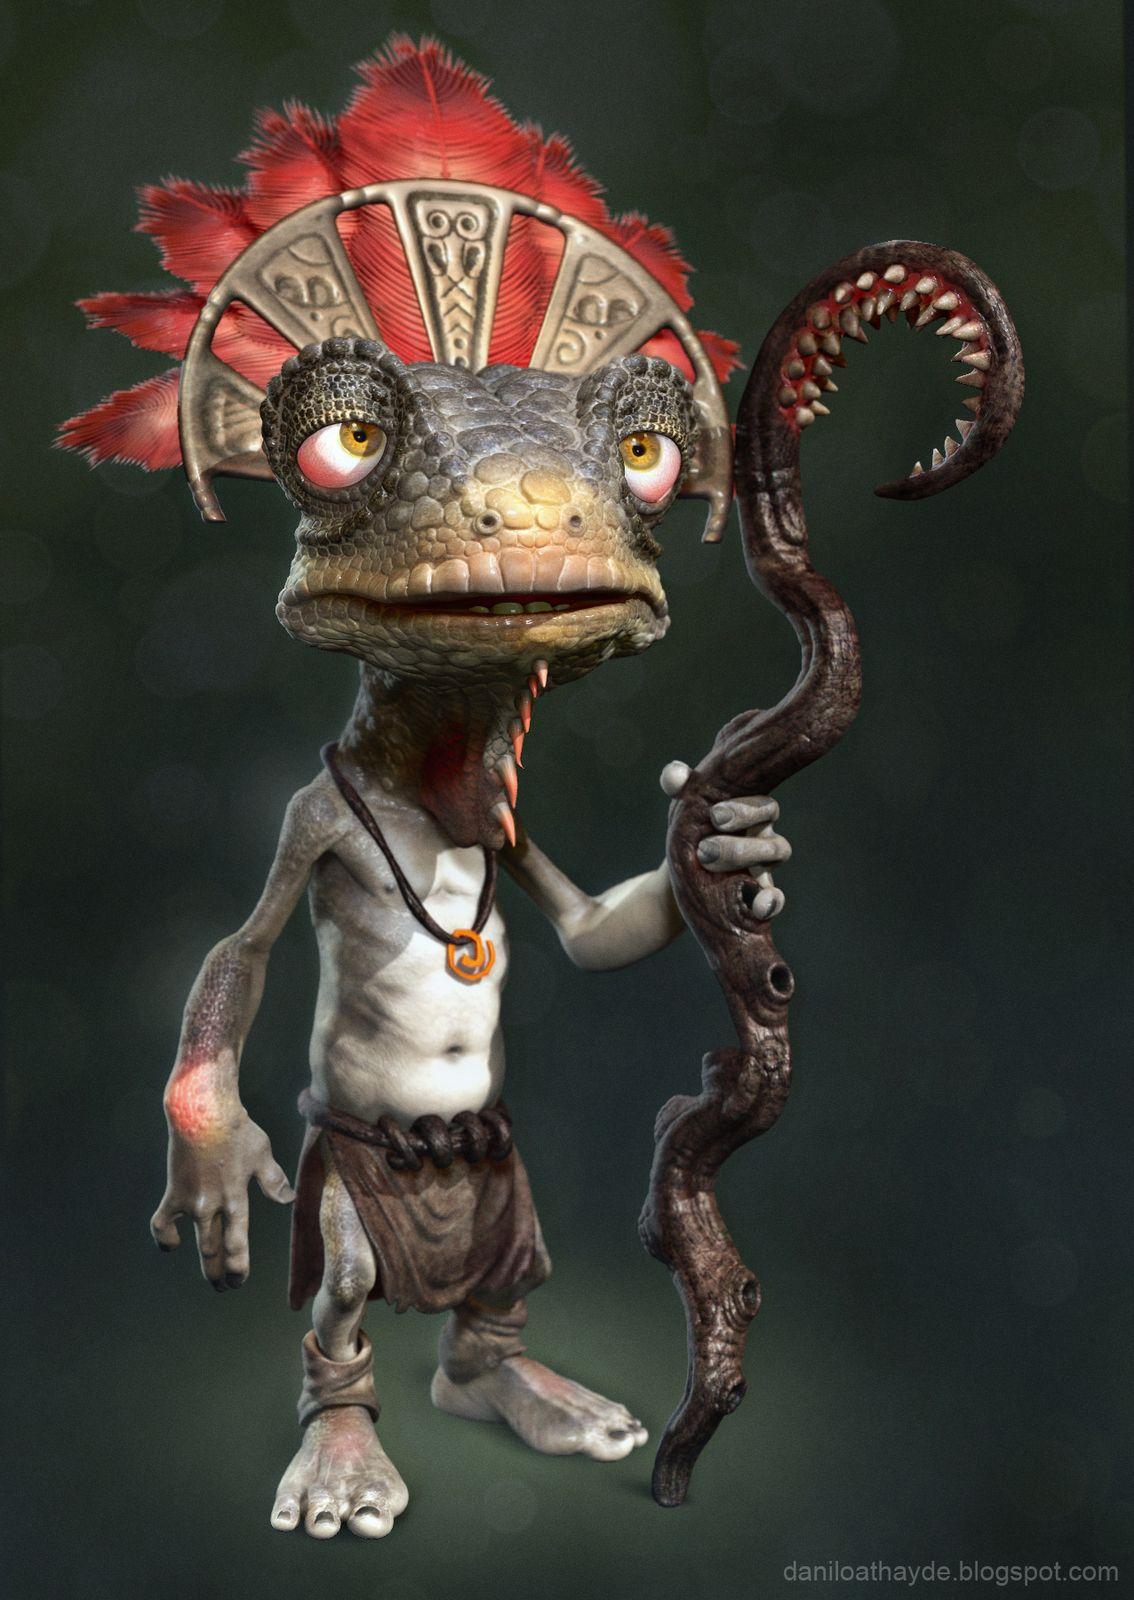 Character Design Zbrush : Iguana king danilo athayde on artstation at https